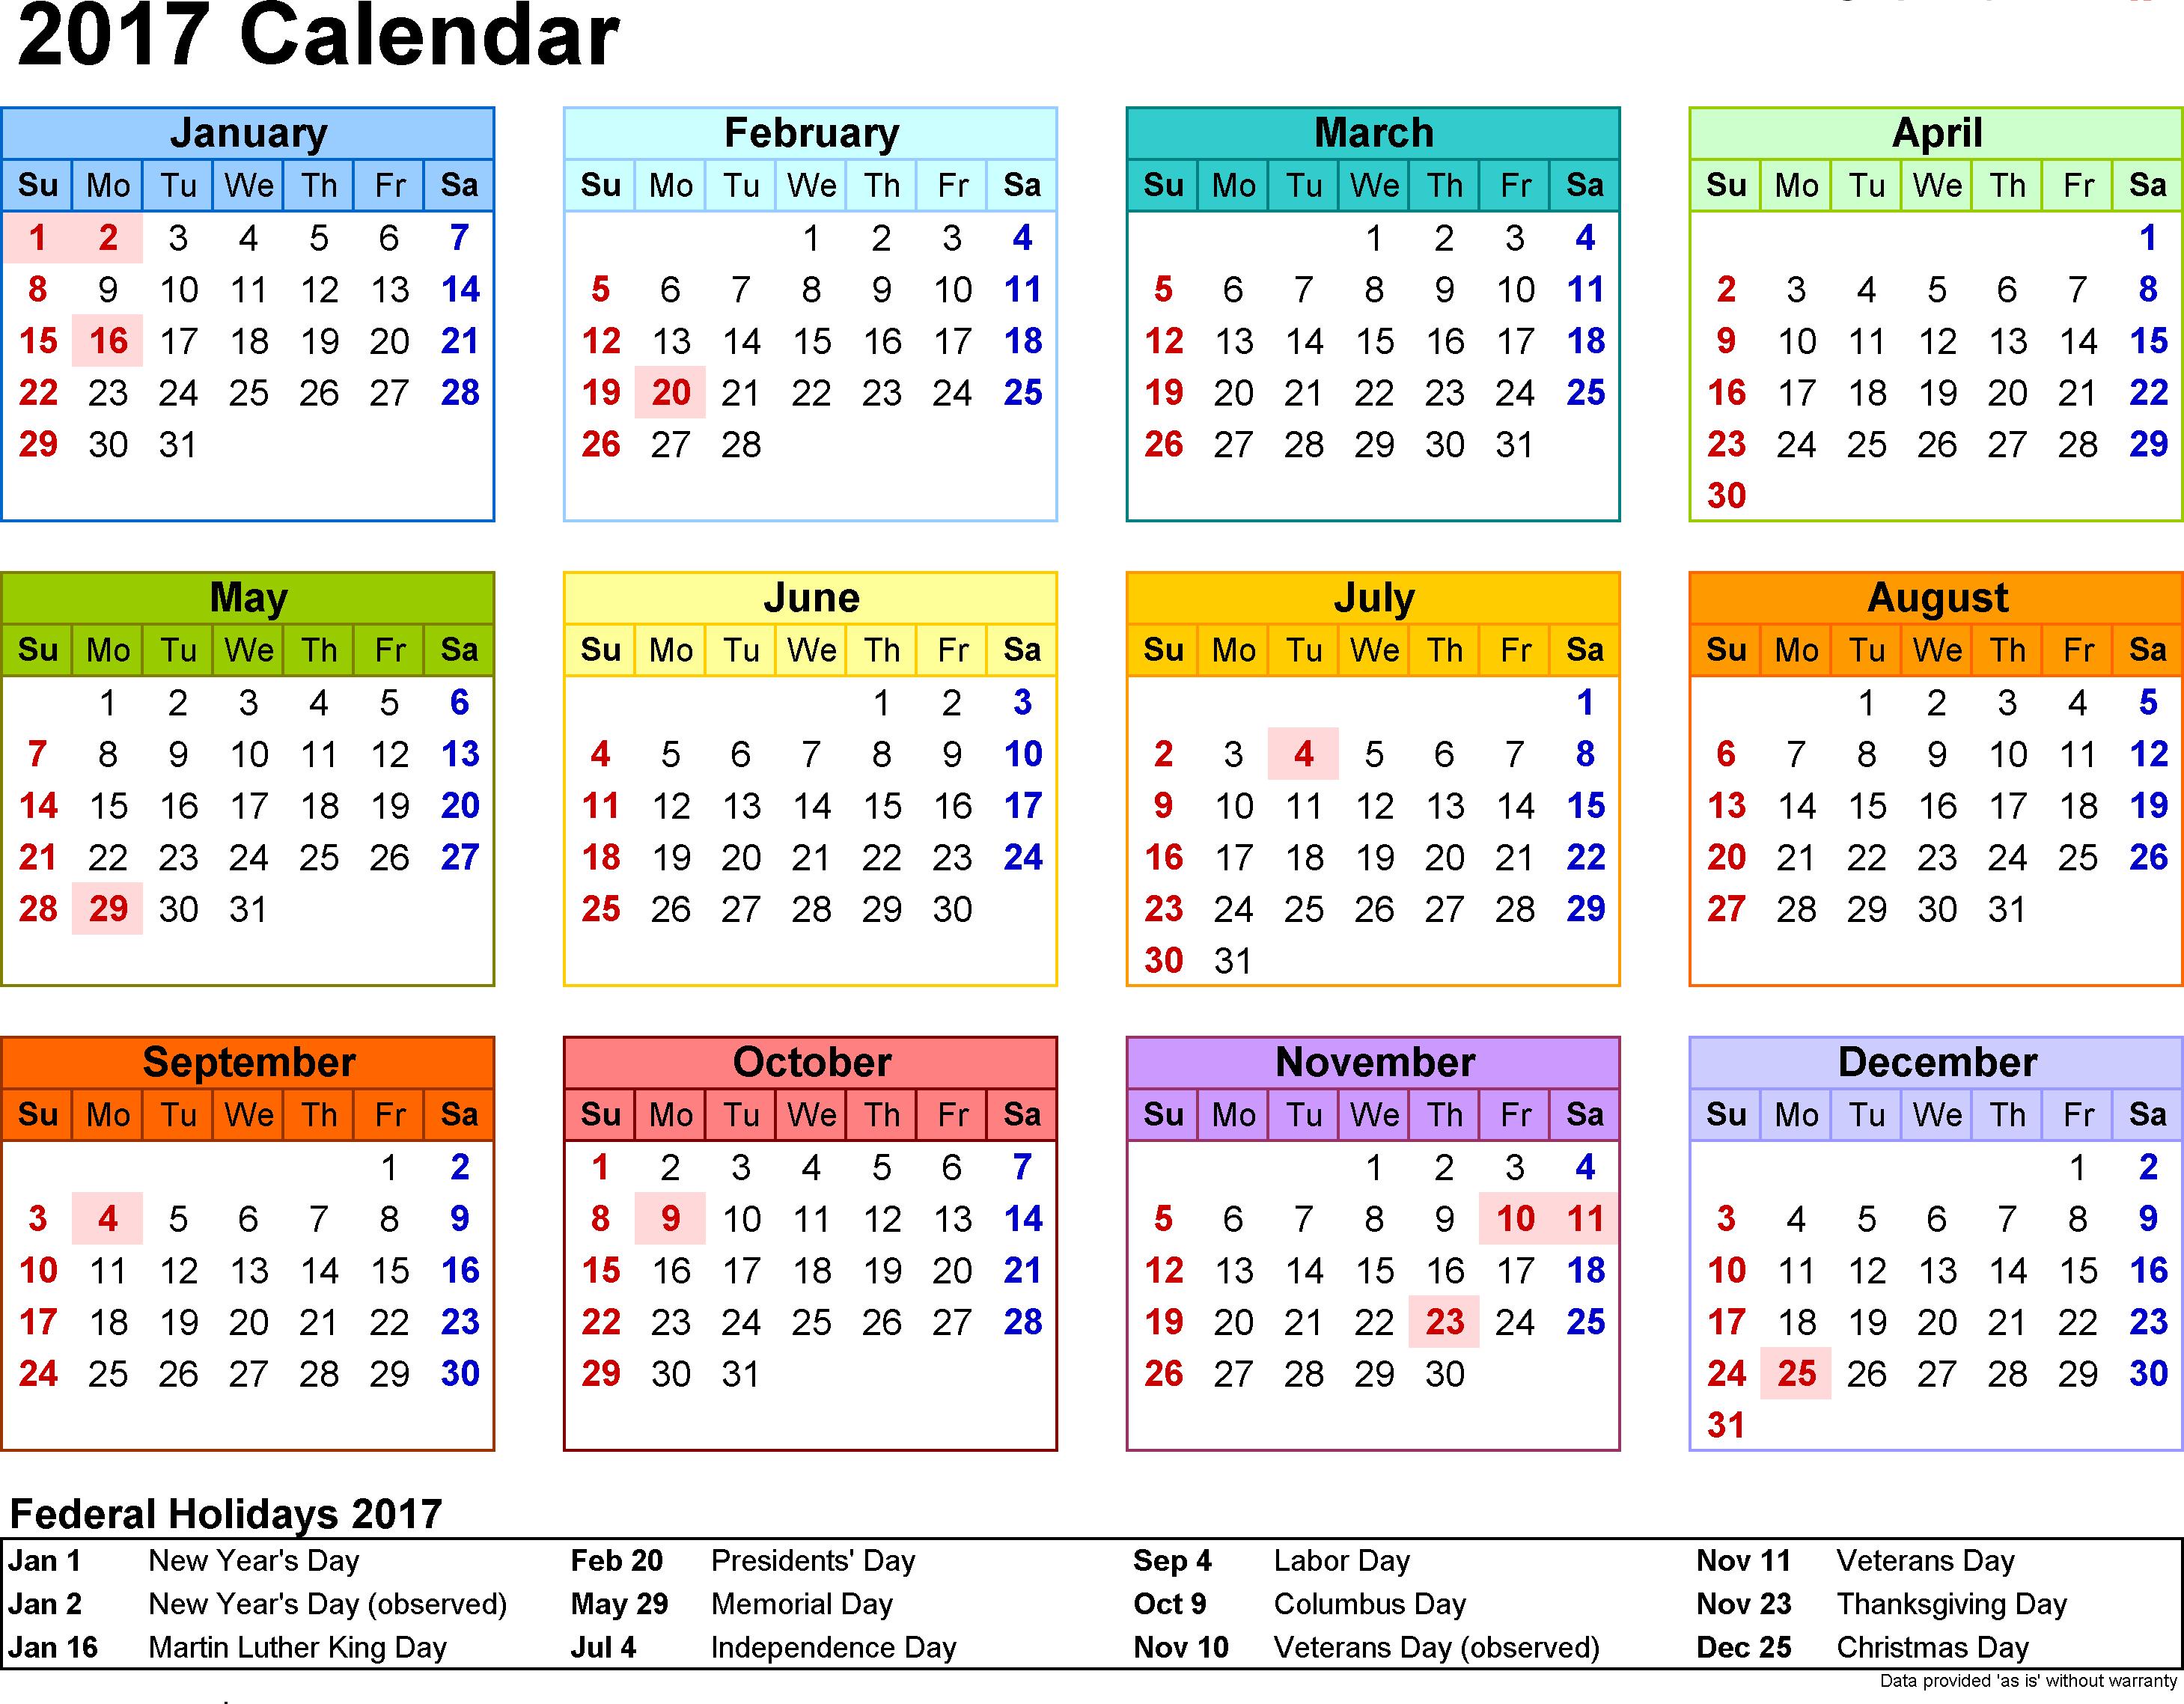 Calendar 2017 - Aol Image Search Results | Calendar 2019